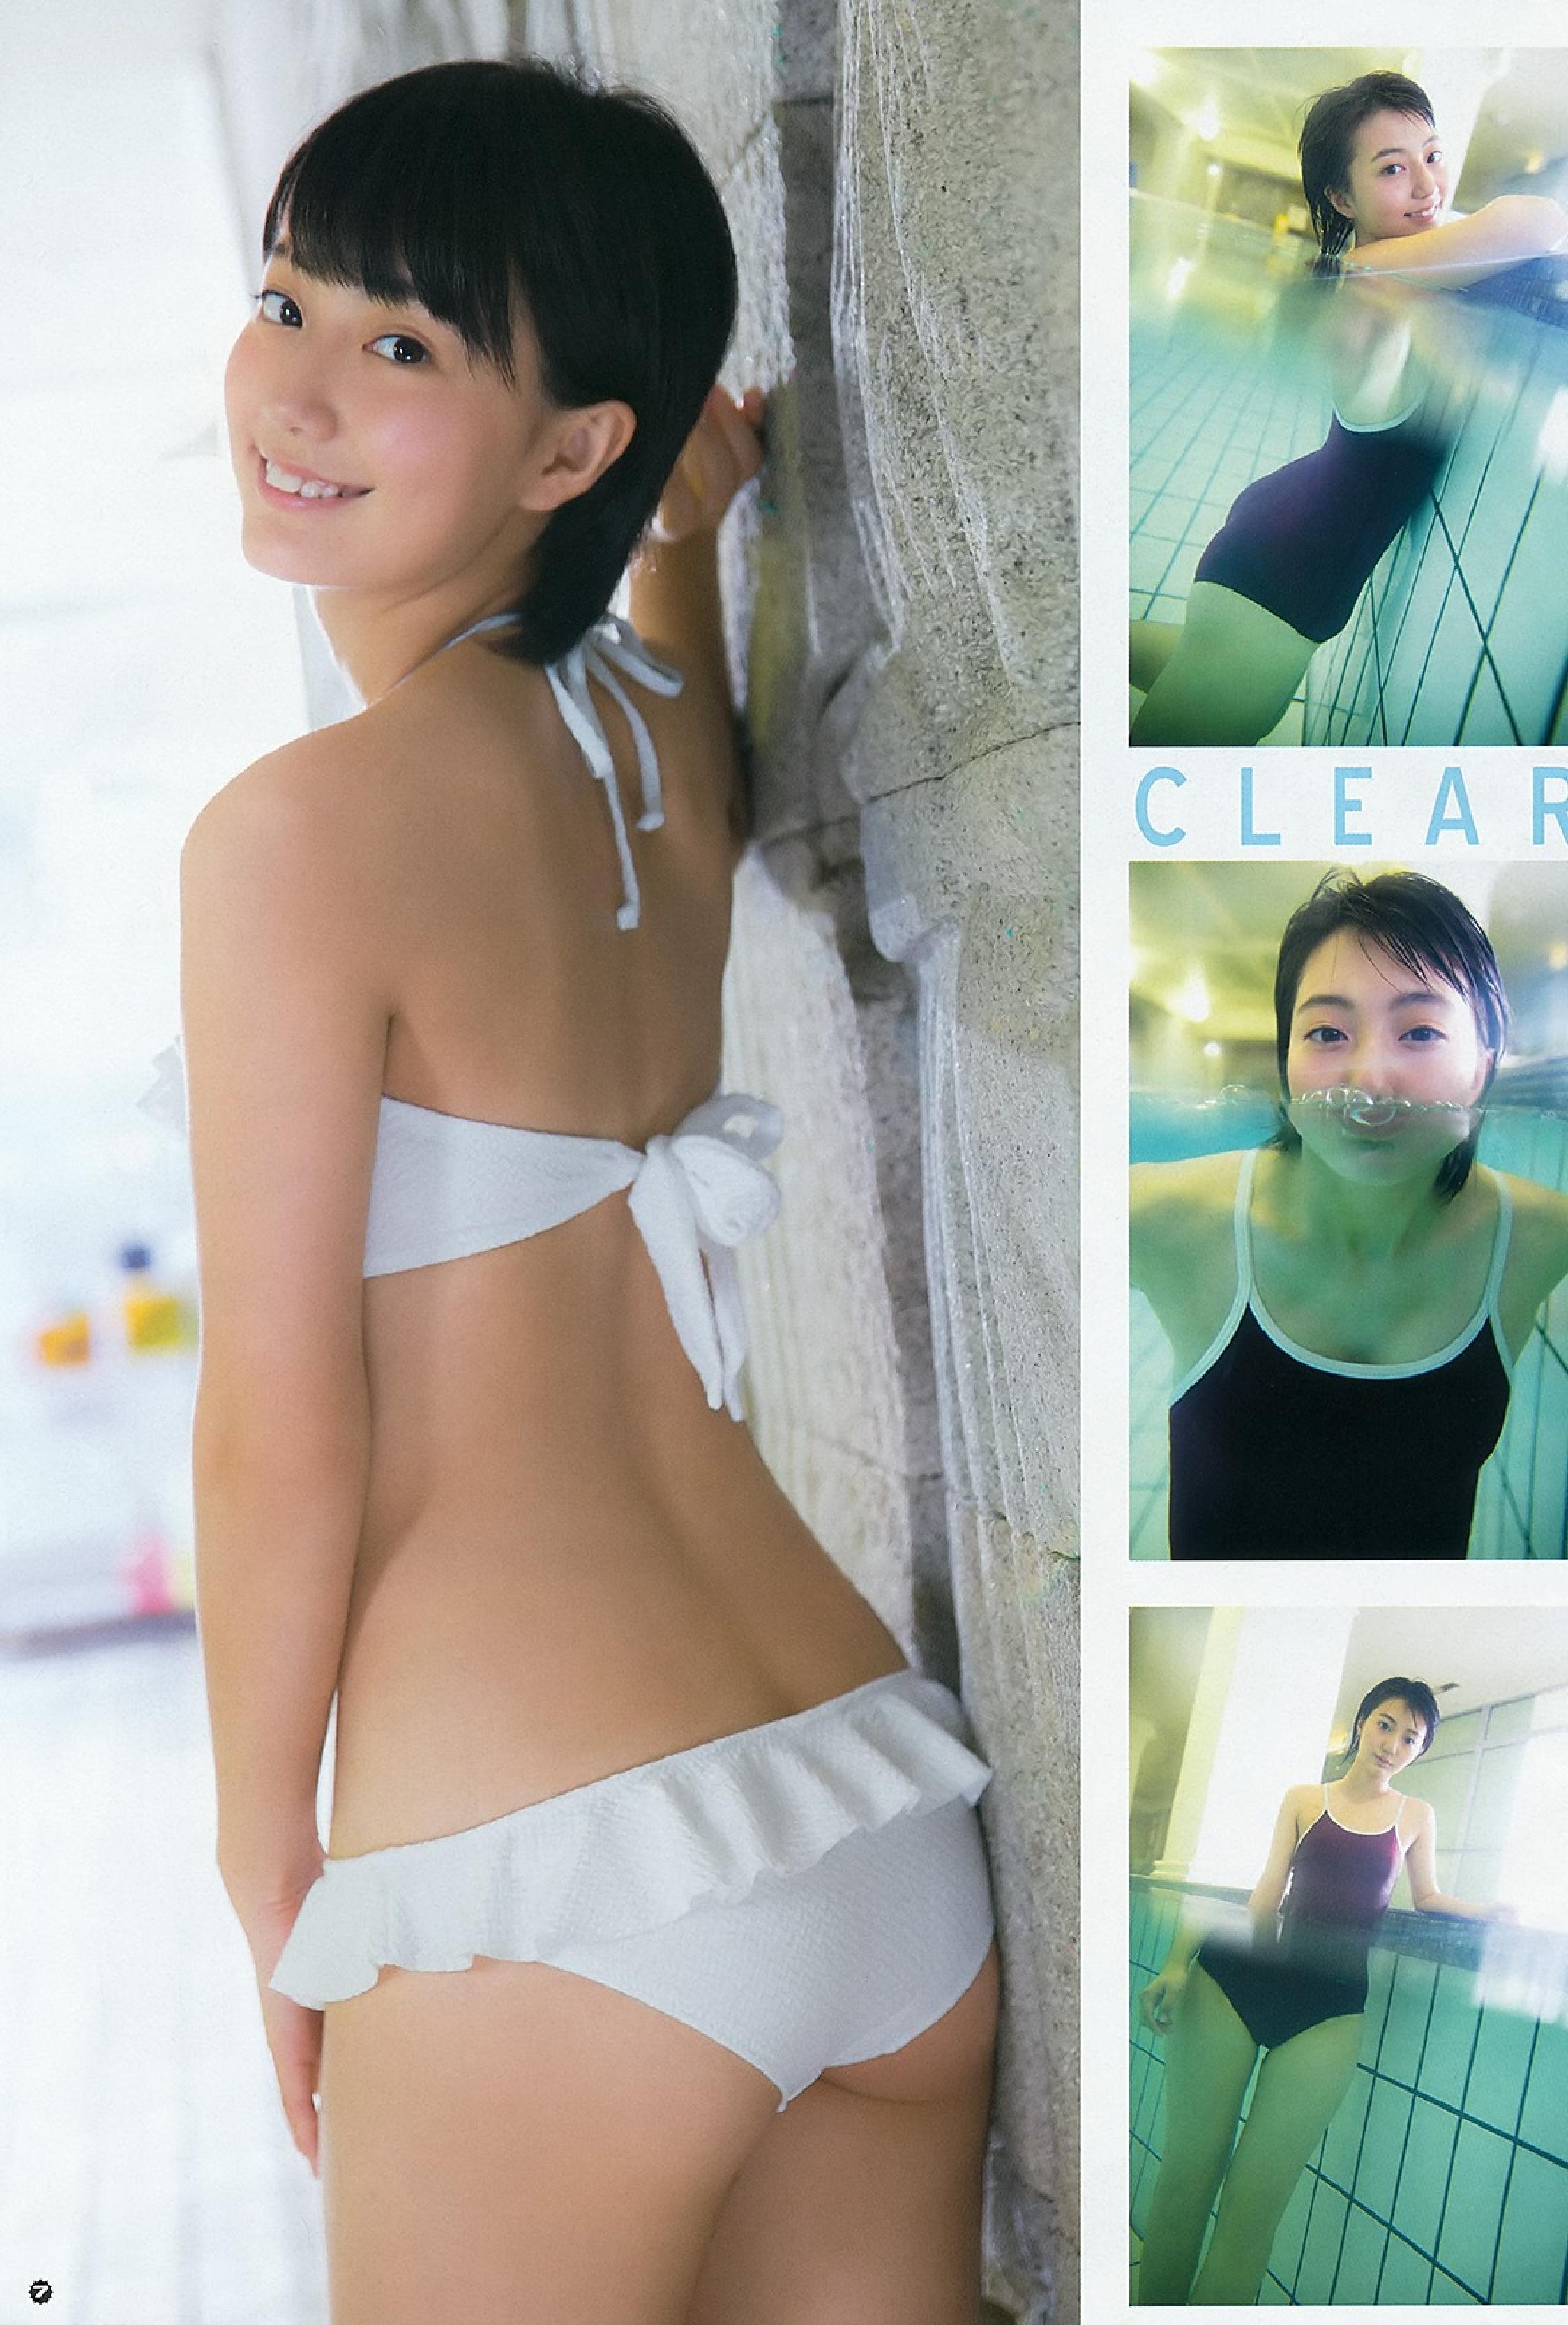 ... | 新井愛瞳 | Manami Arai) - Young Gangan, 2015.6.5 - eyval.net